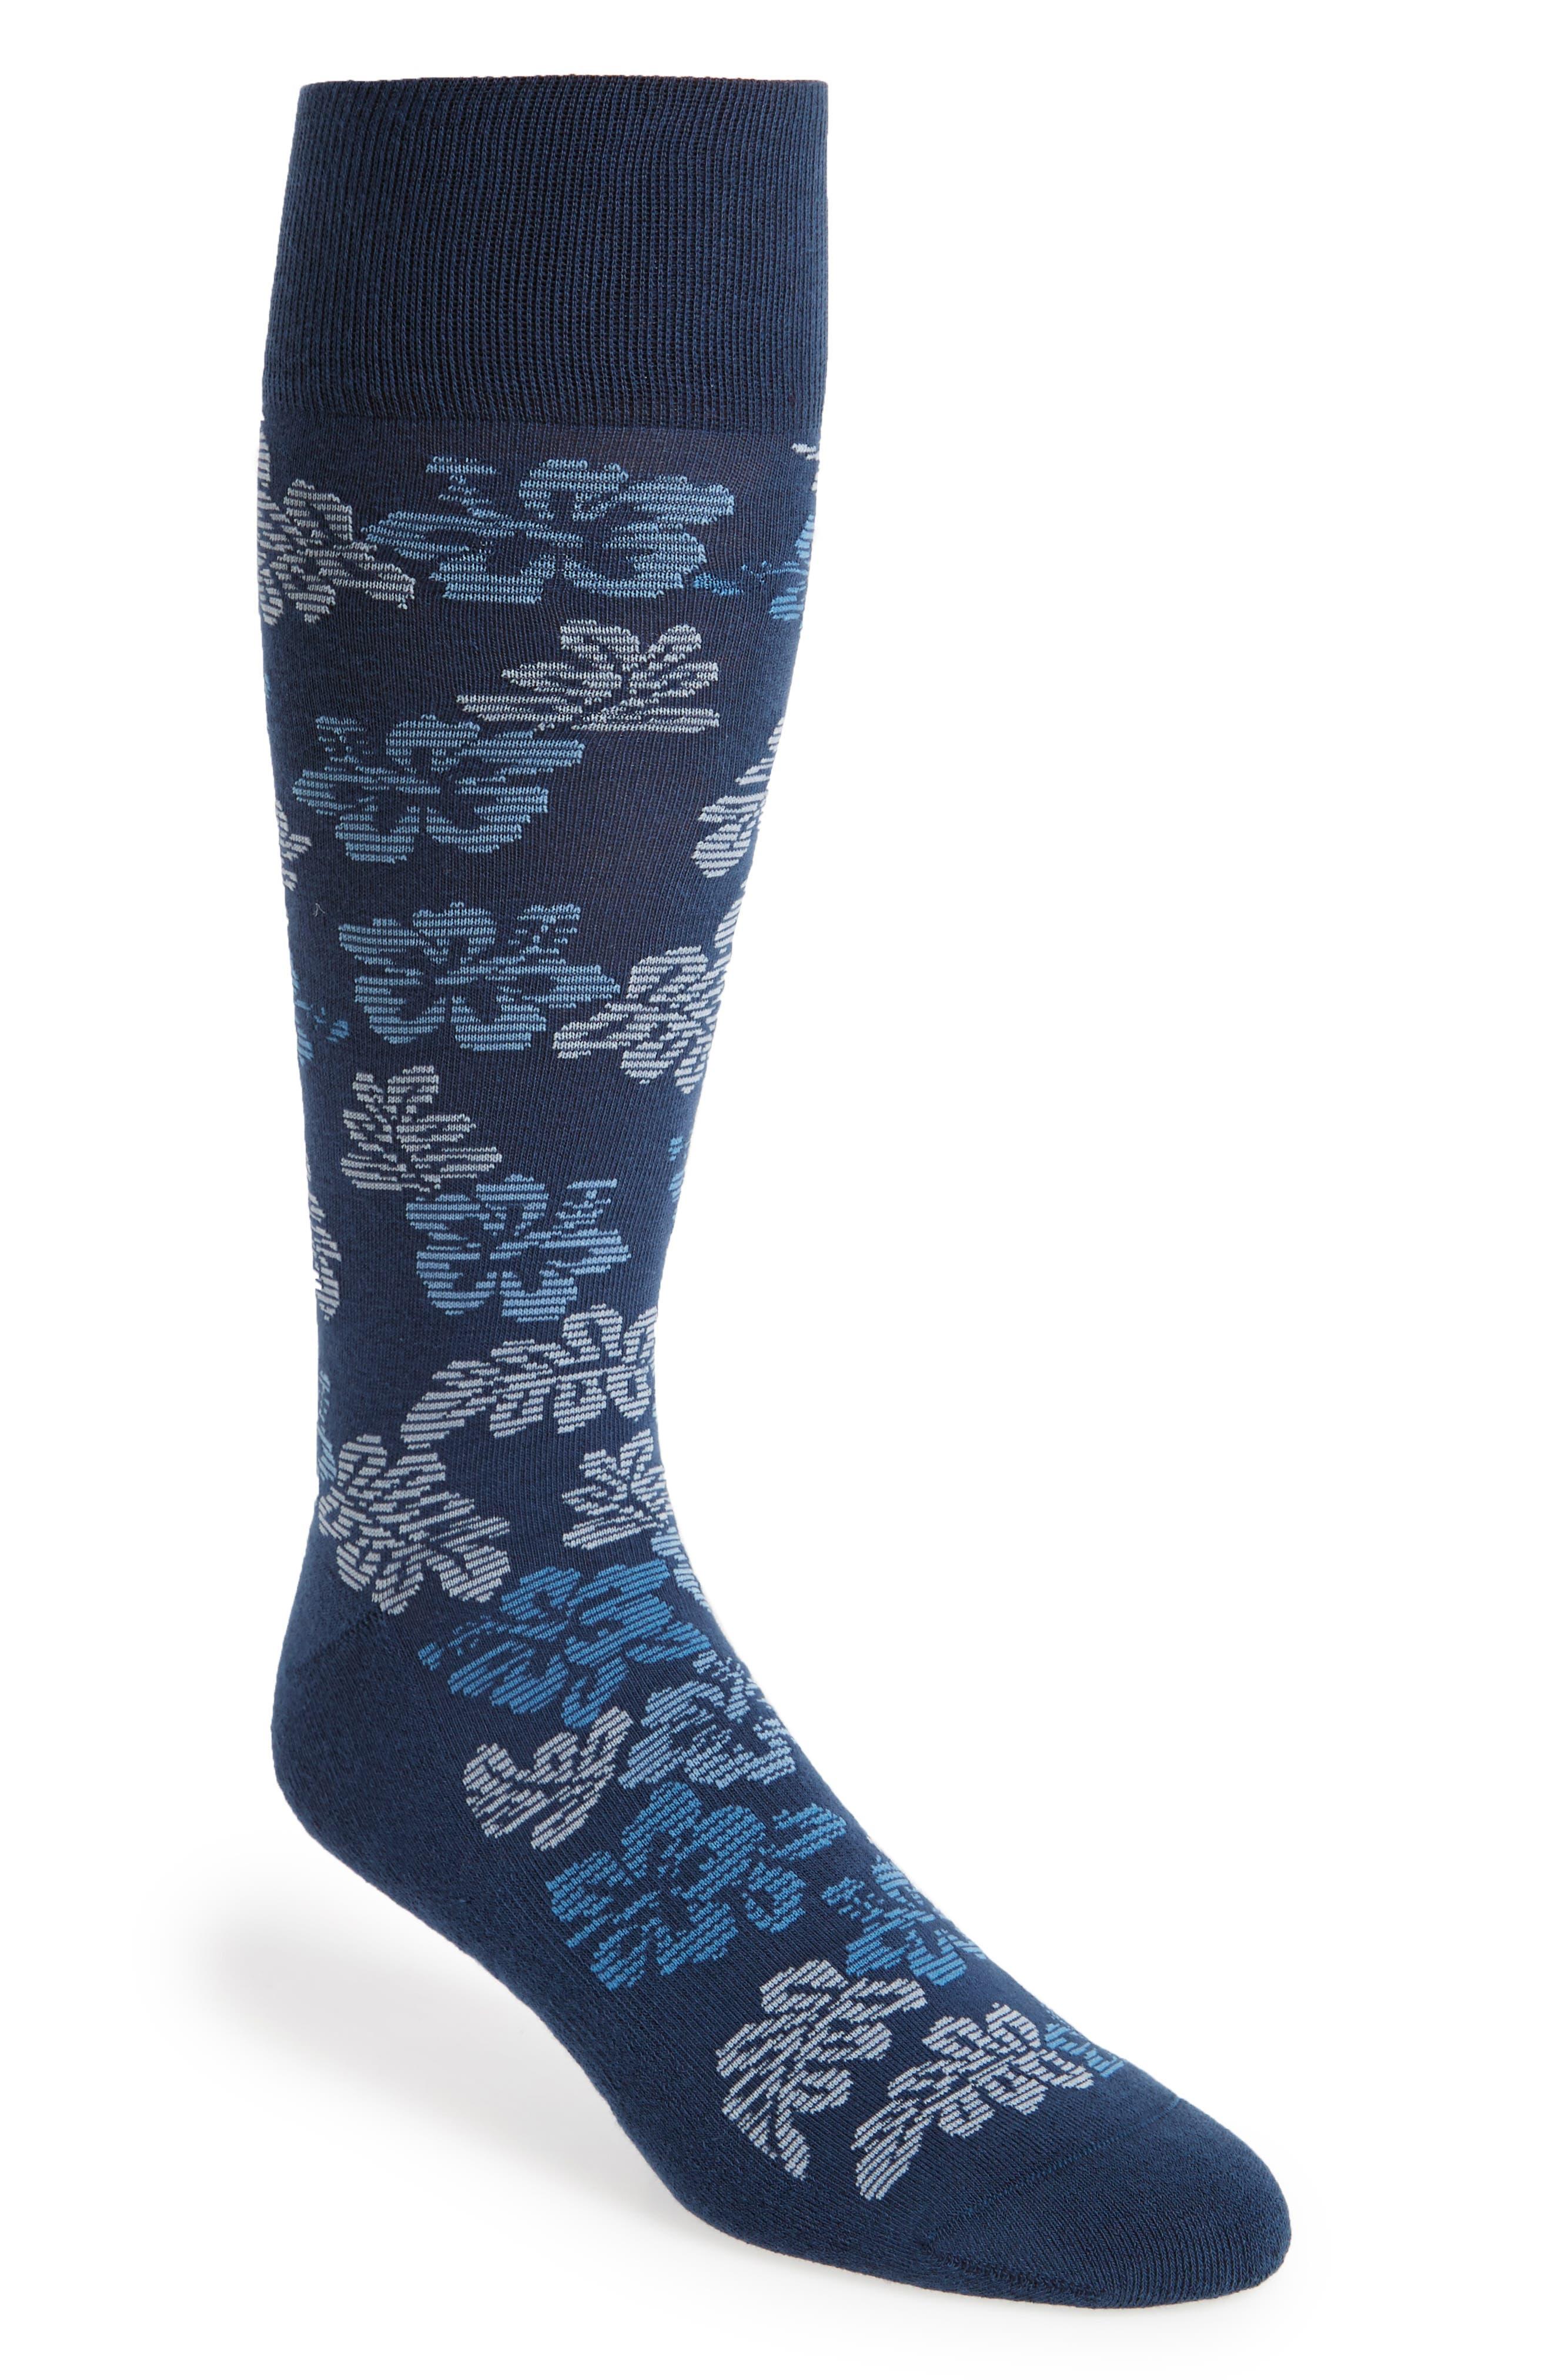 Hibiscus Vibe Socks,                             Main thumbnail 1, color,                             410